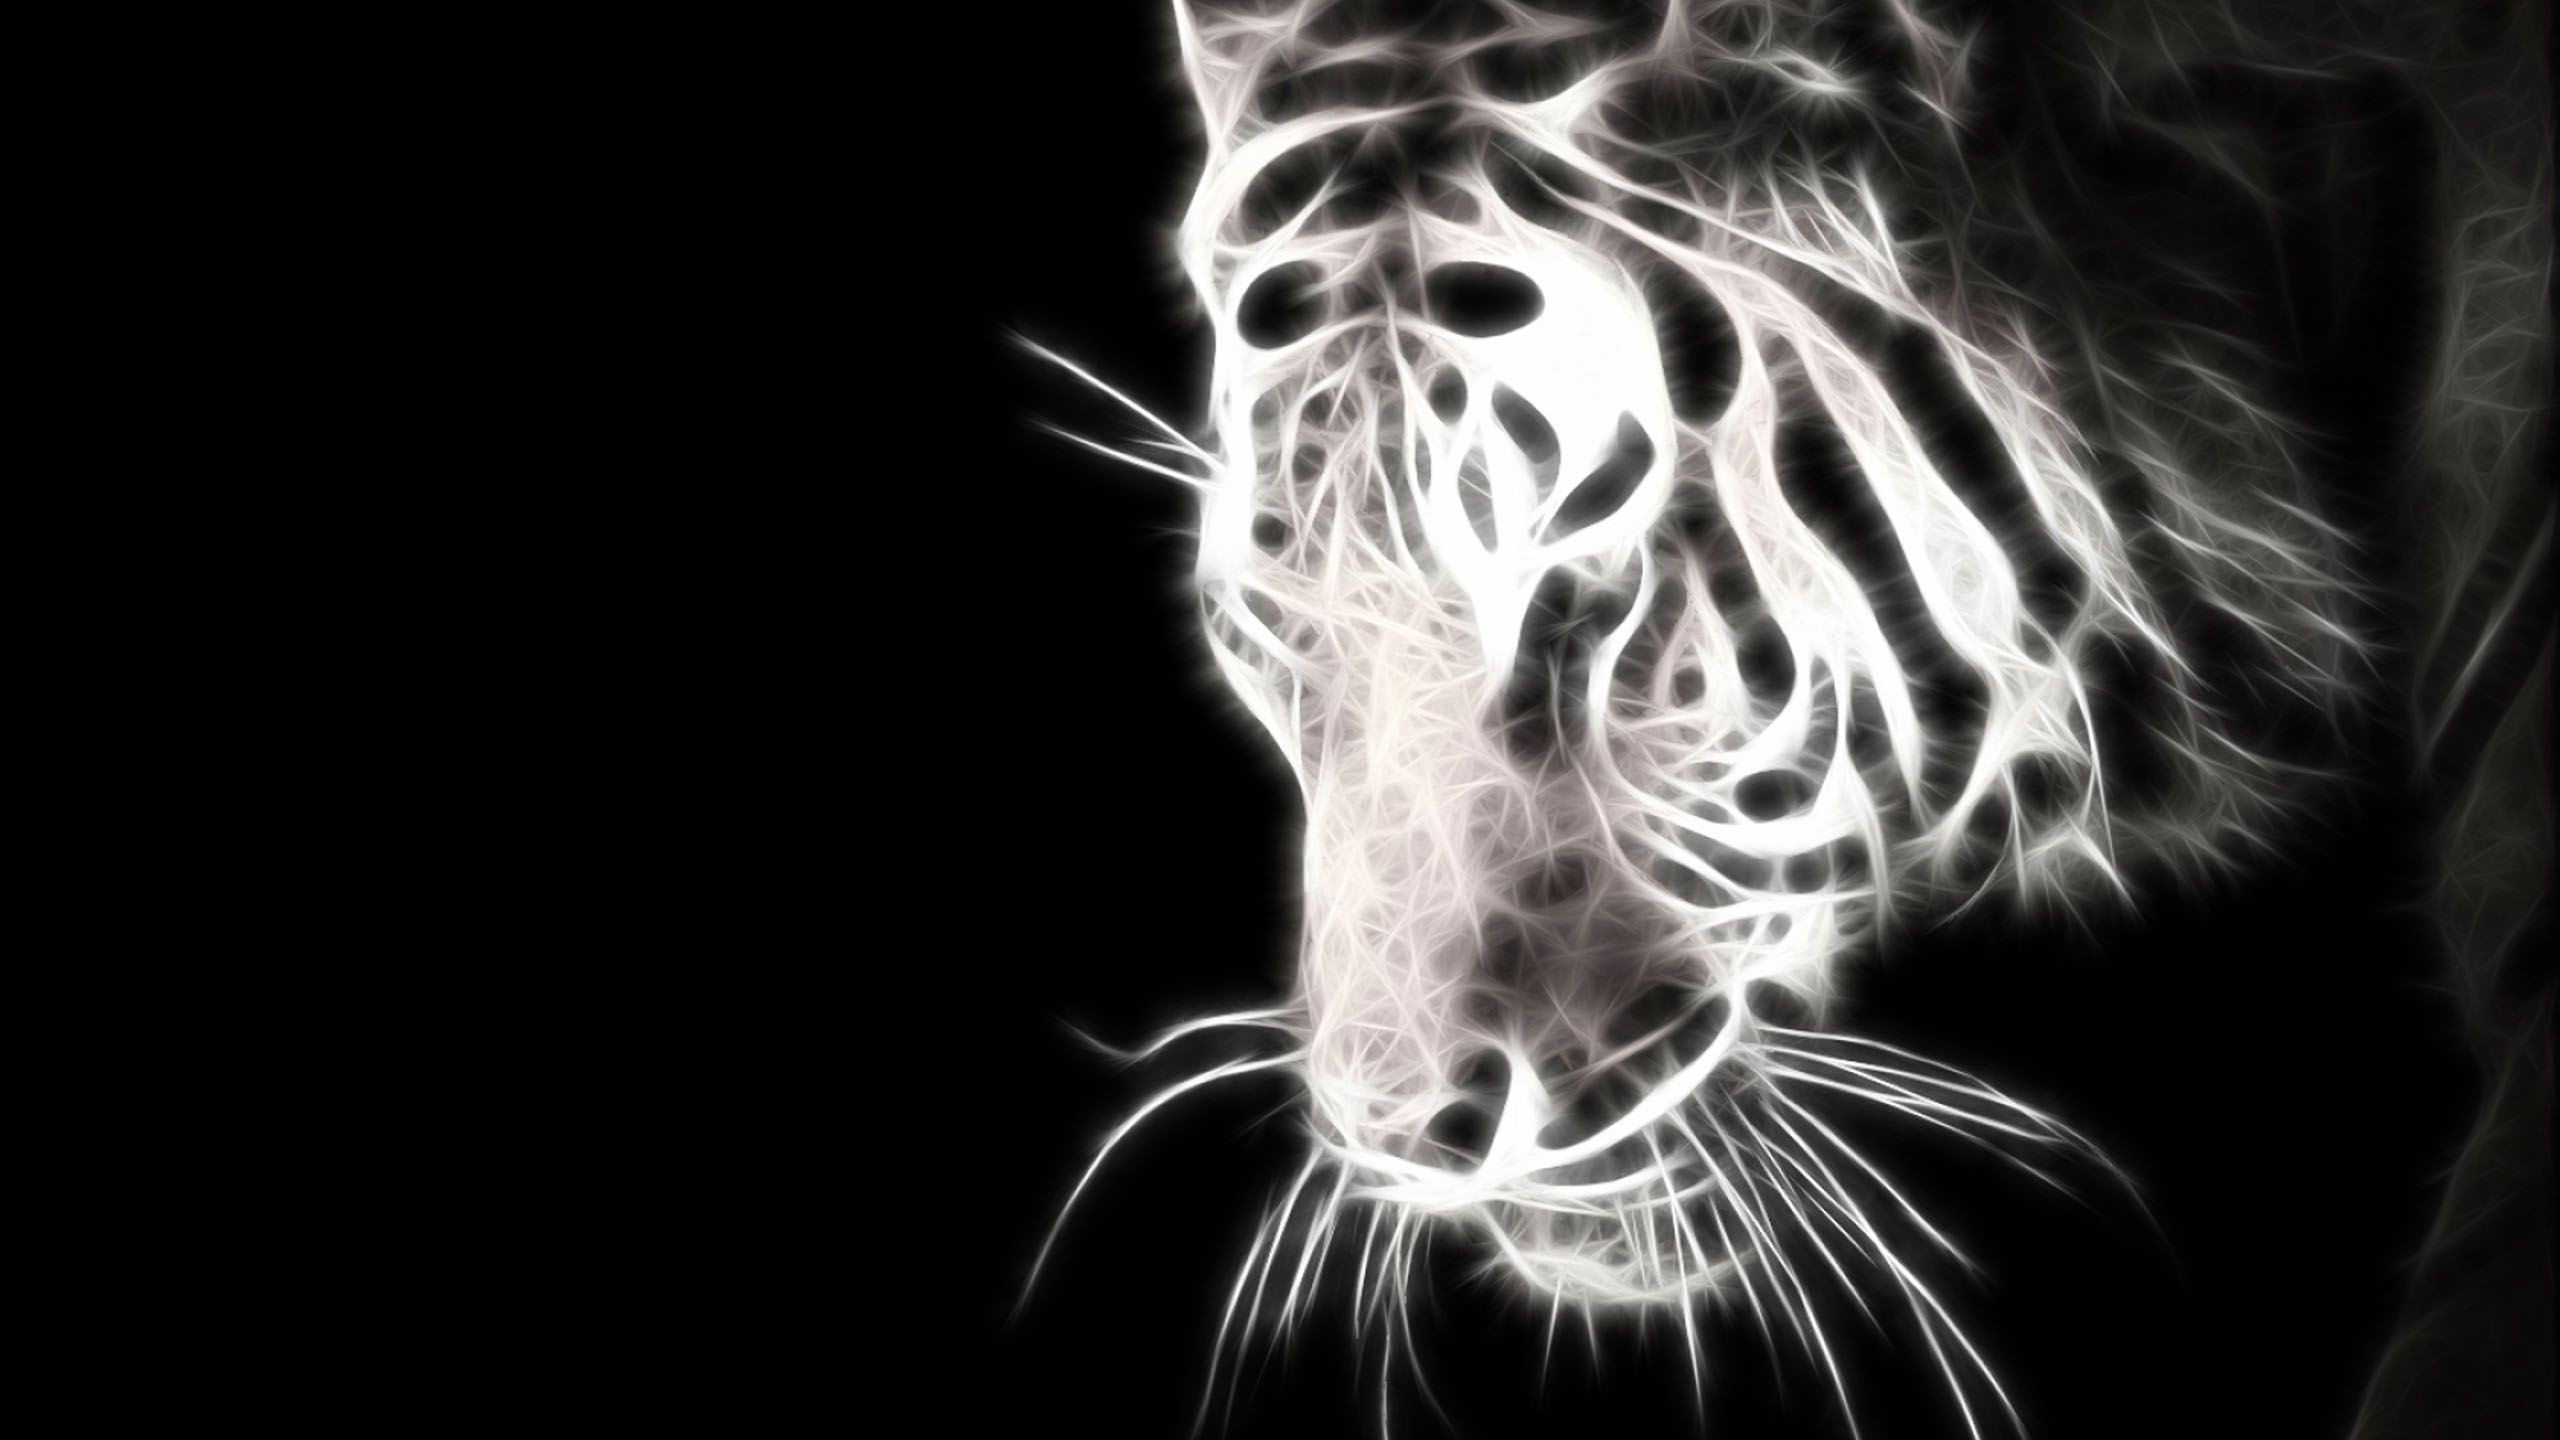 white tiger blue eyes wallpaper white tiger blue eye samsung s5230